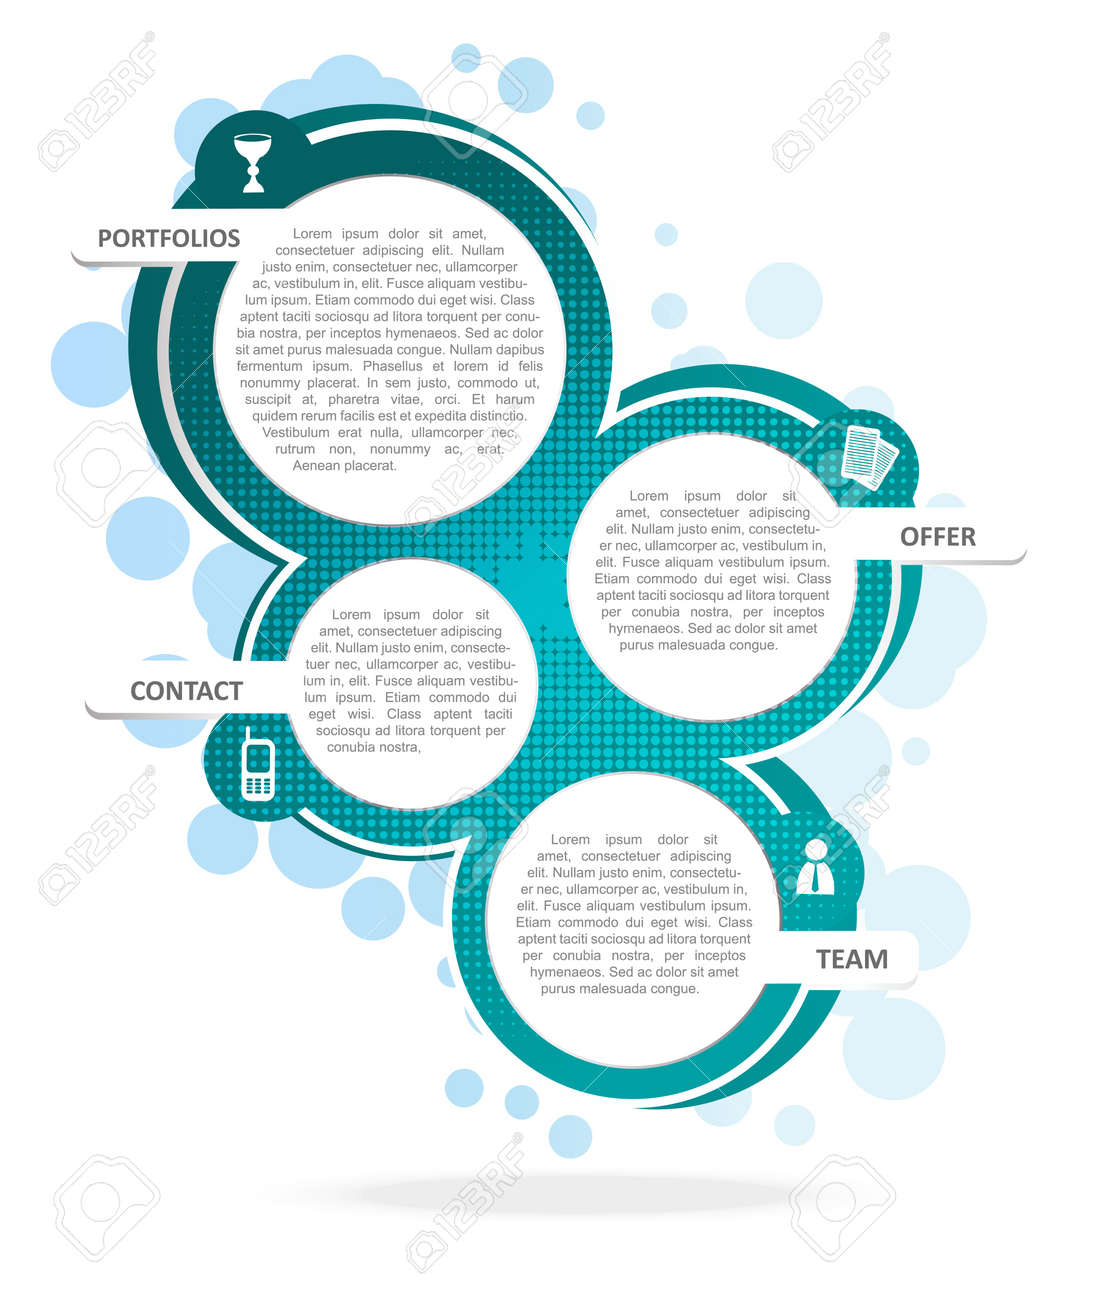 Background Concept Design For Brochure Or Website Royalty Free ...